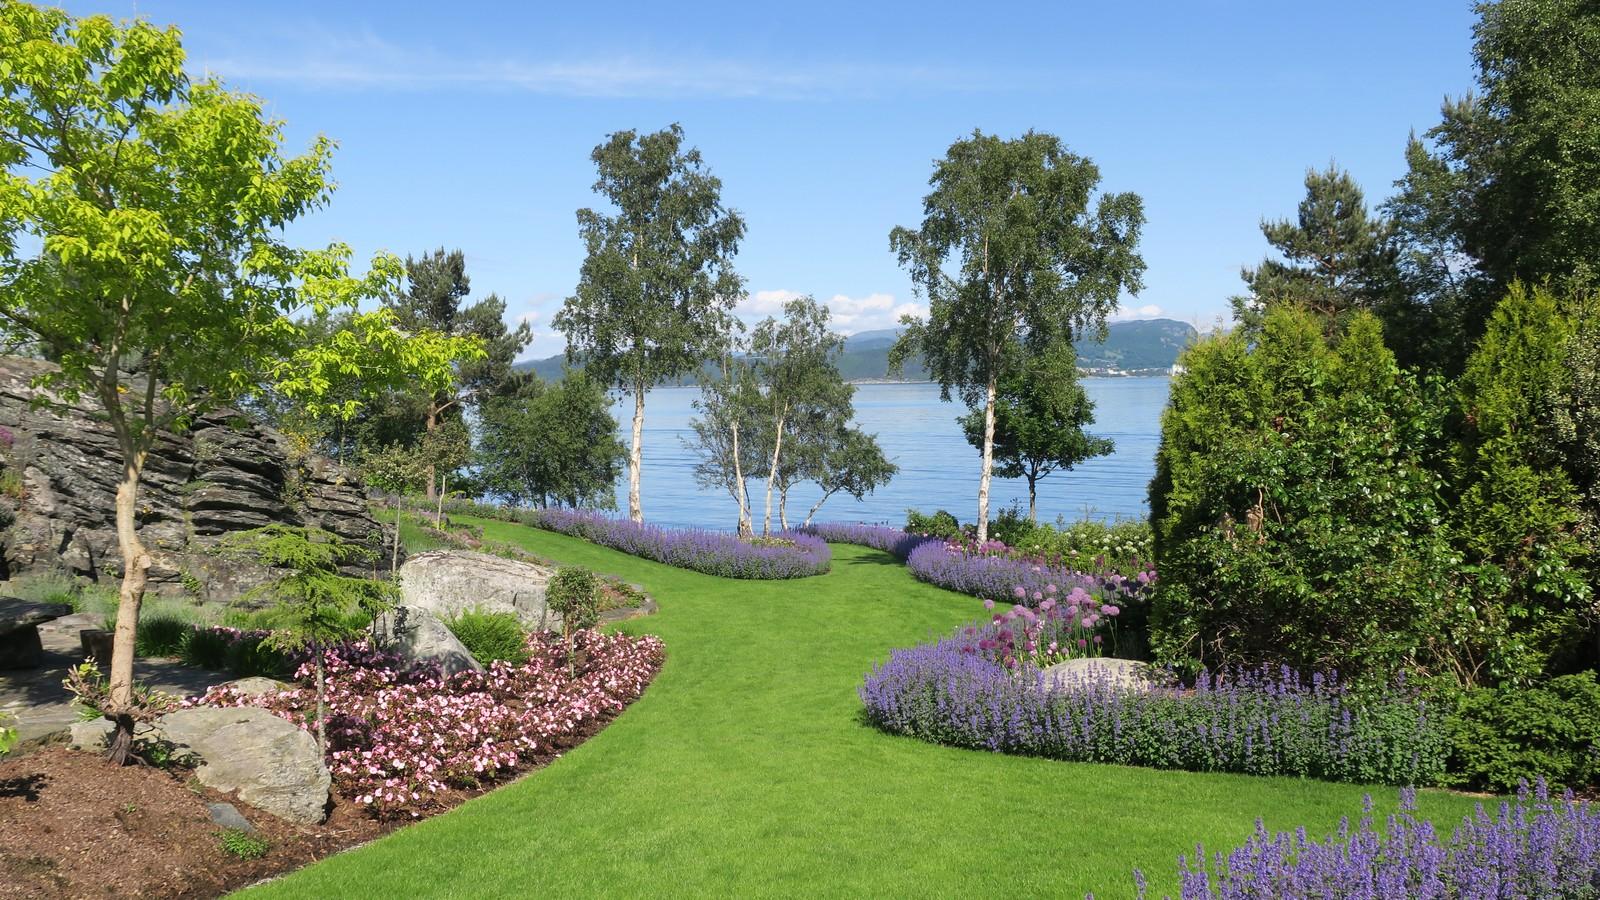 Fra Flor og fjære på Sør-Hidle, Strand kommune.